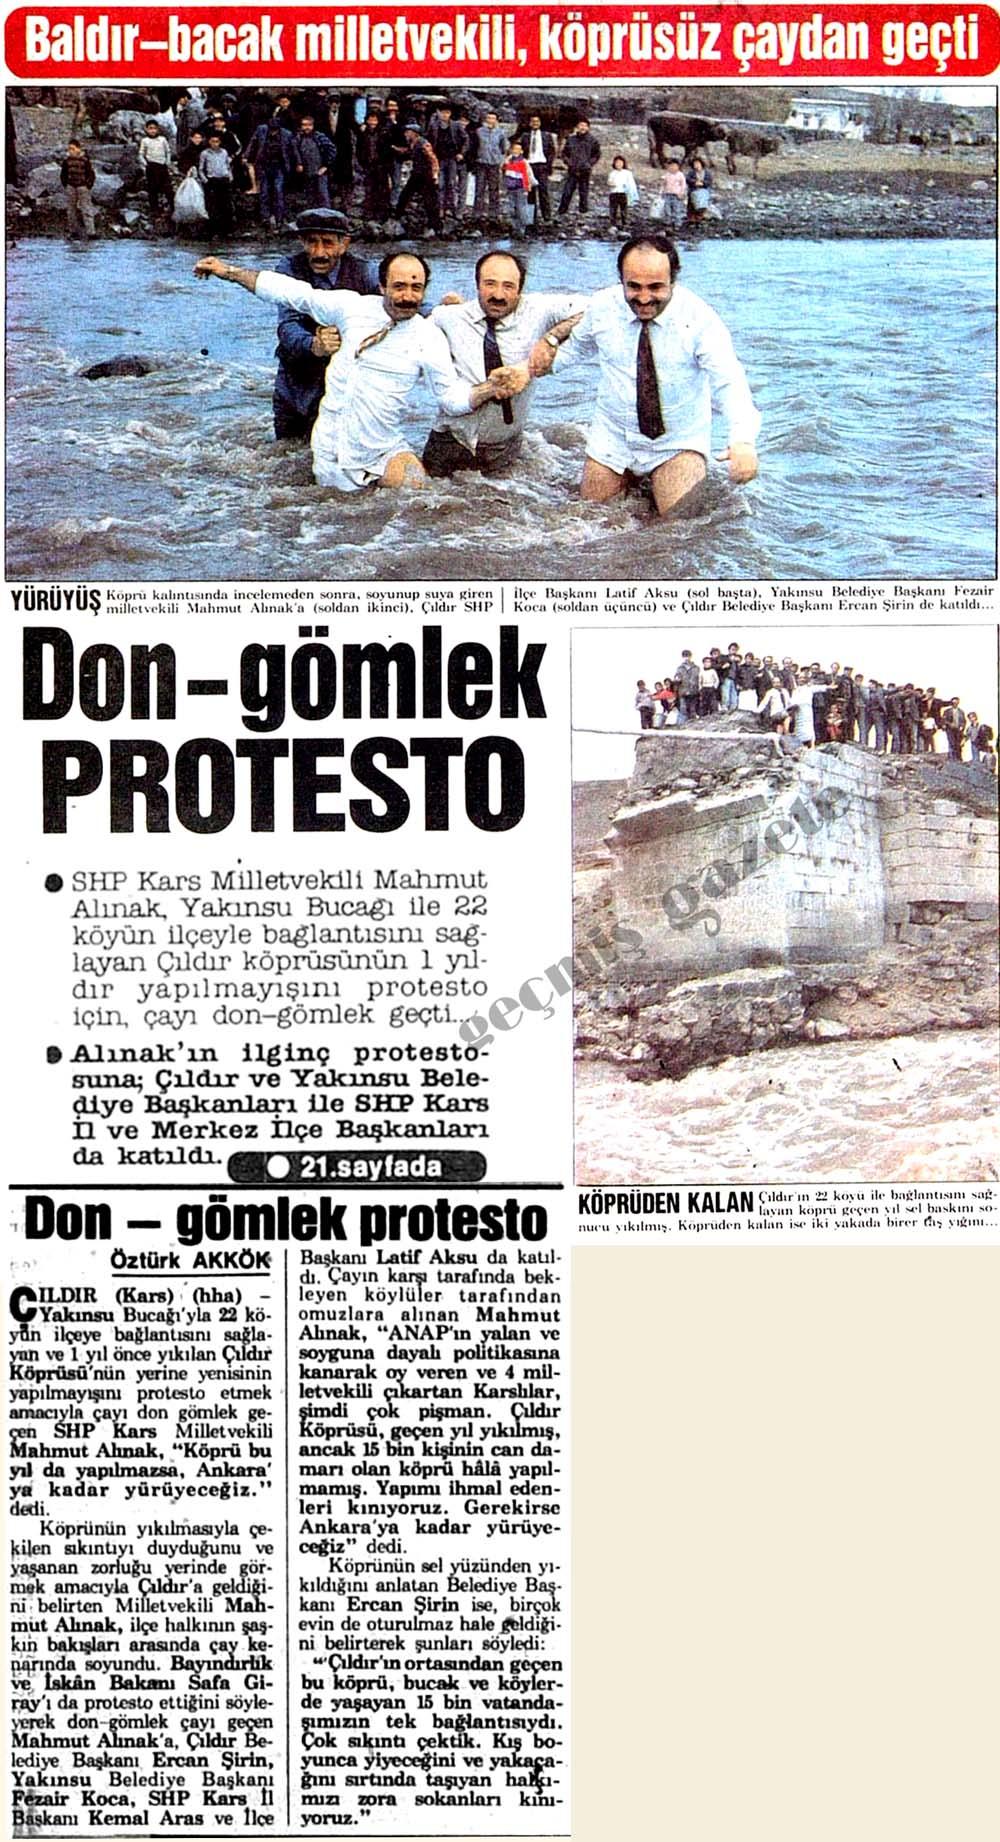 Don-gömlek protesto